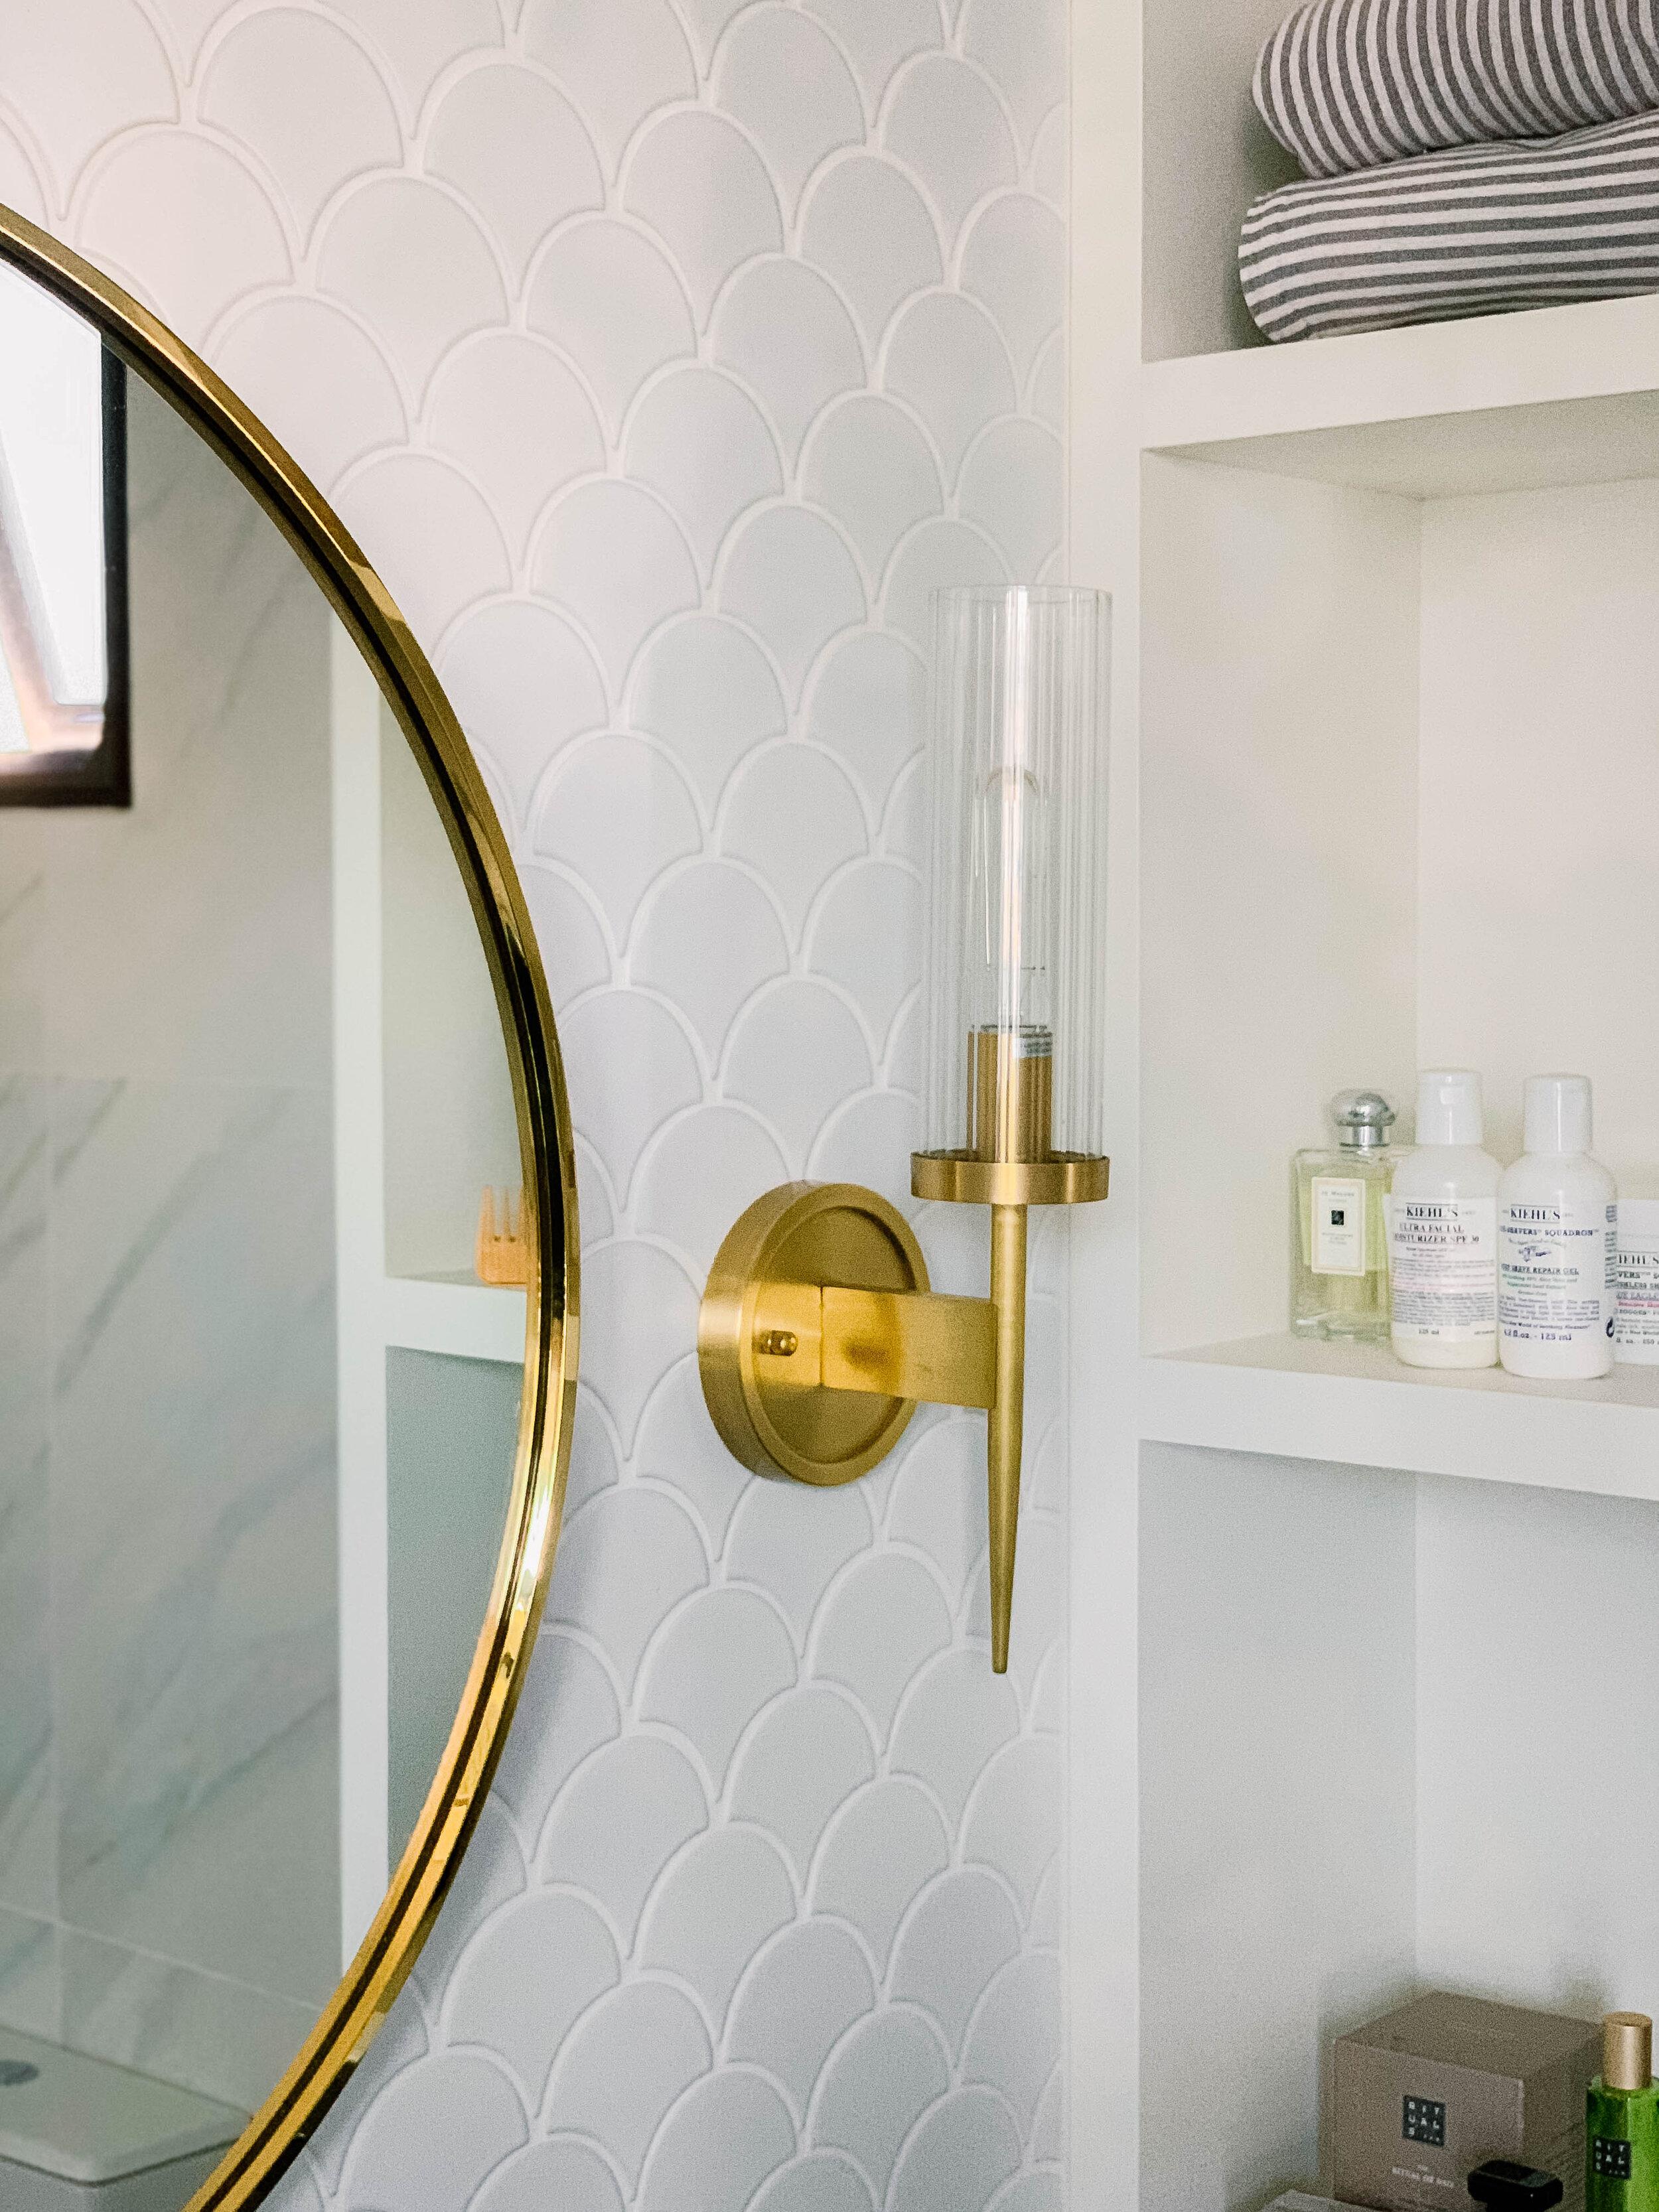 Chic Grey and Gold Bathroom Design (4 of 7).jpg